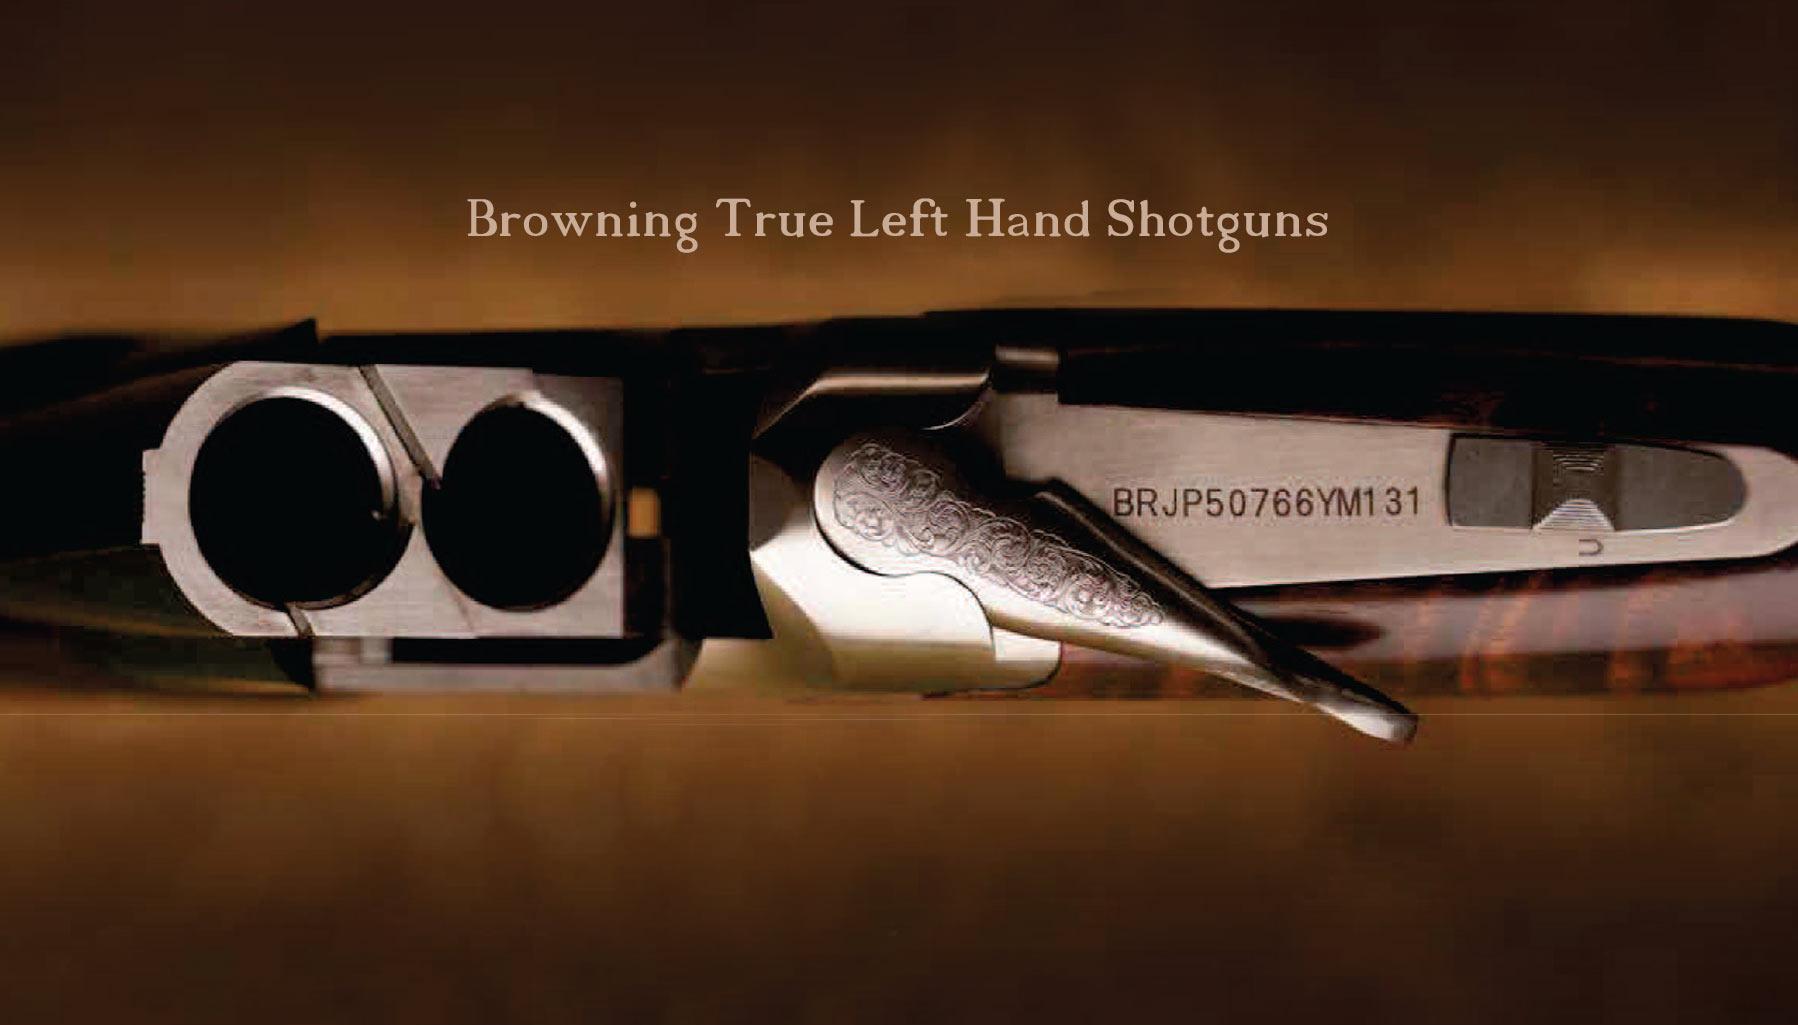 Browning True Left Hand Shotguns